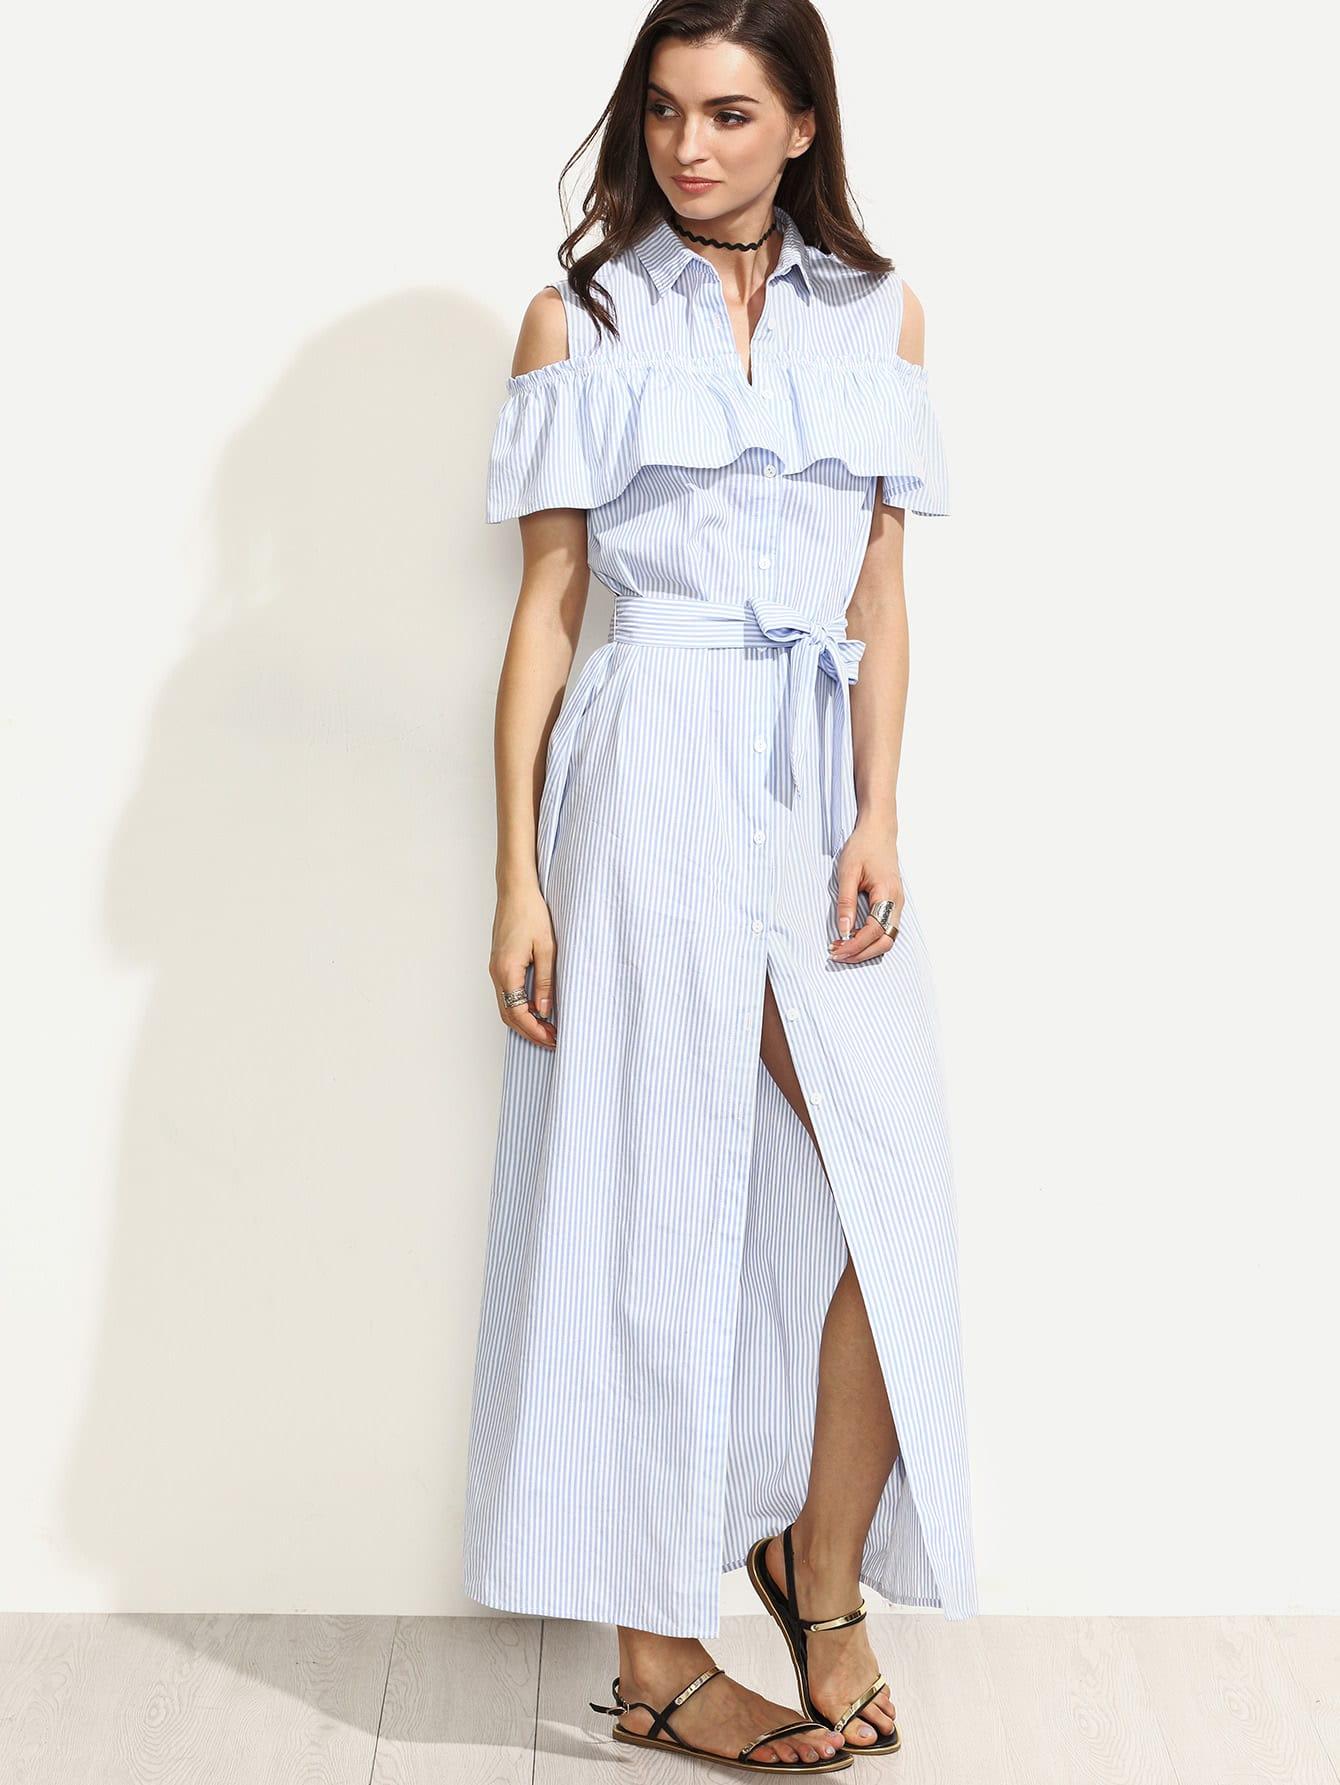 Blue Striped Cold Shoulder Ruffle Tie Waist Long Dress